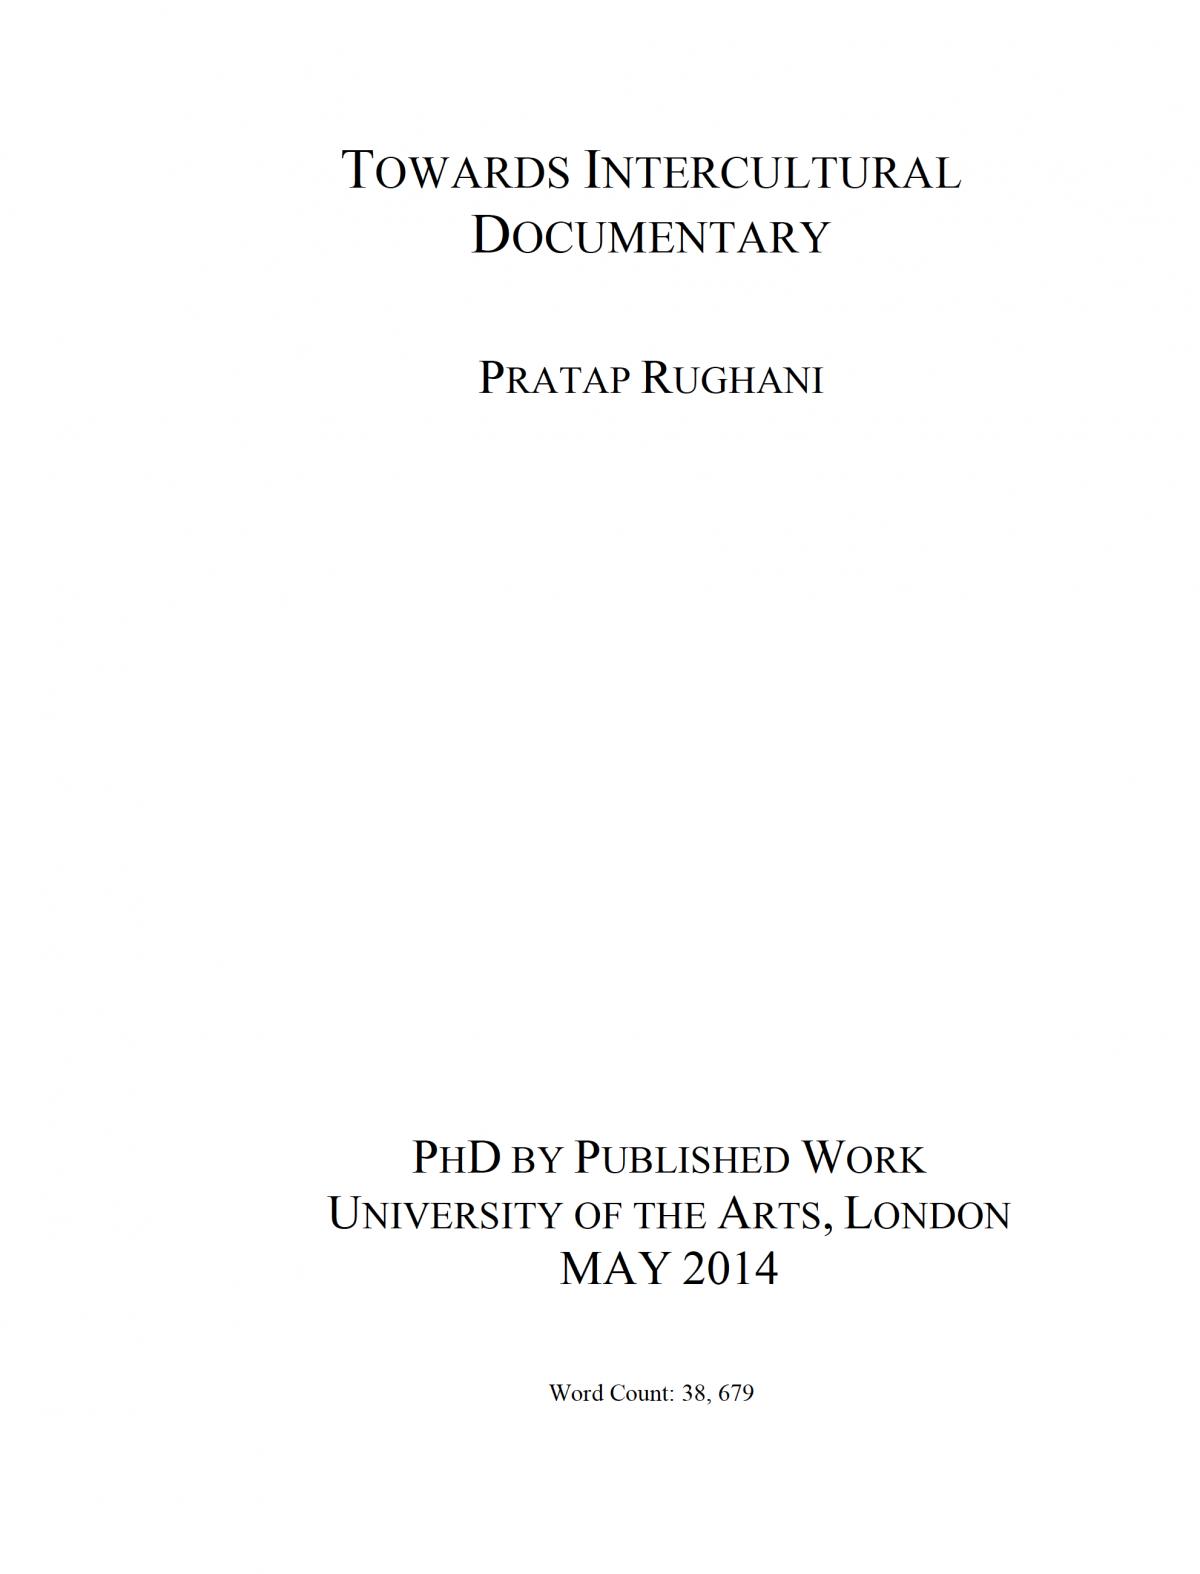 PhD Pratap Rughani 2014